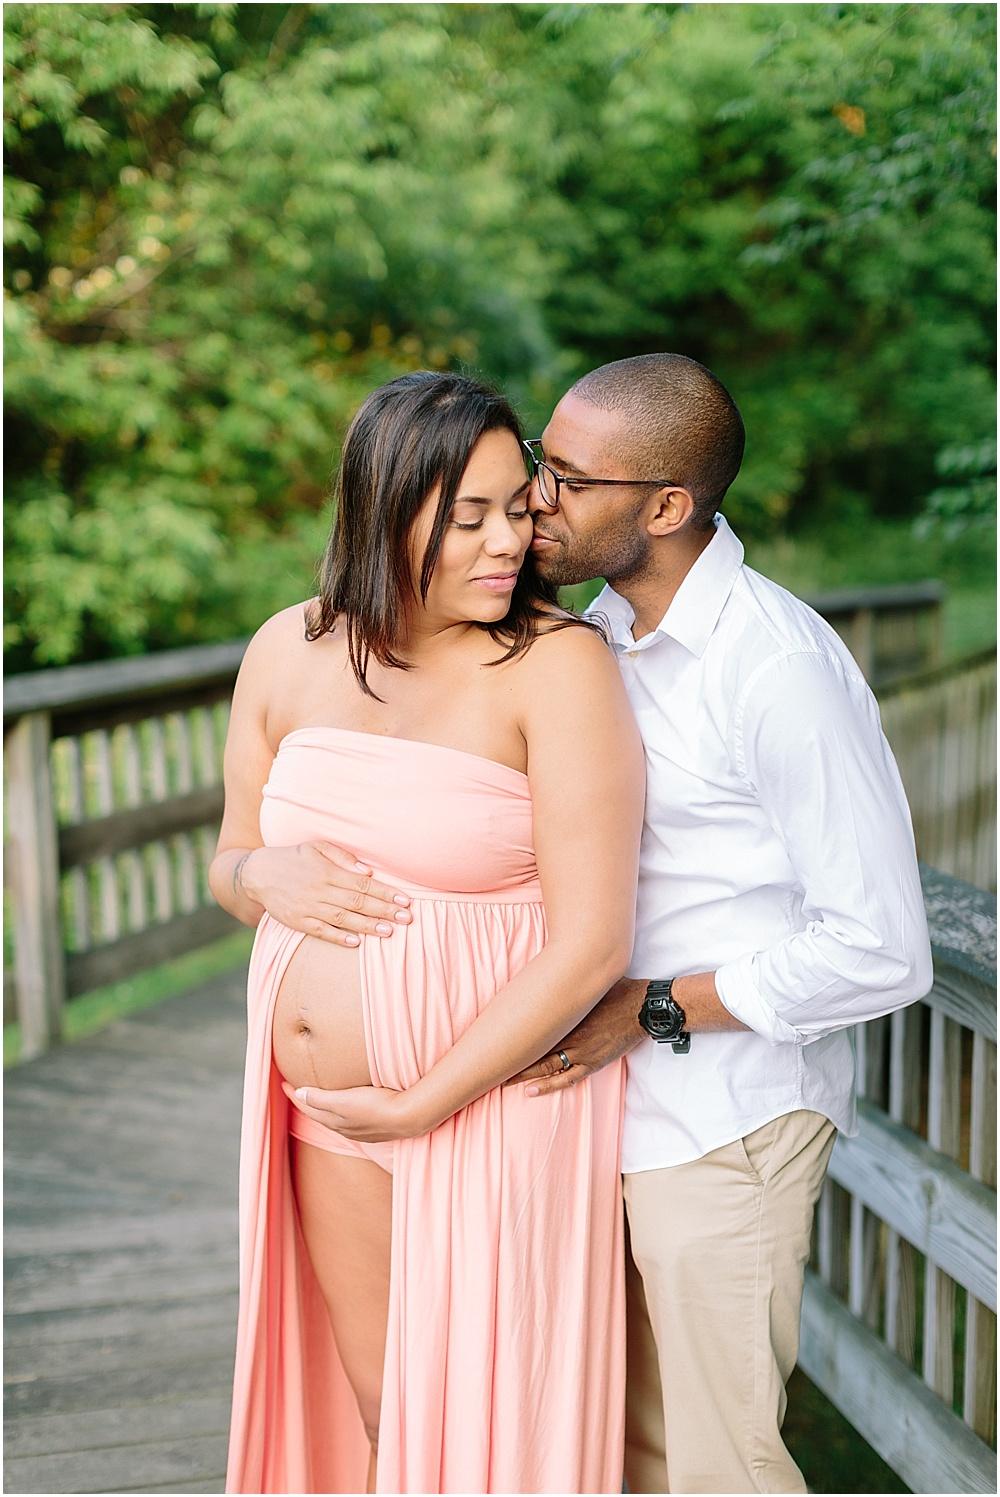 Terrapin_Beach_Stevensville_Maryland_Maternity_Photographer_0002